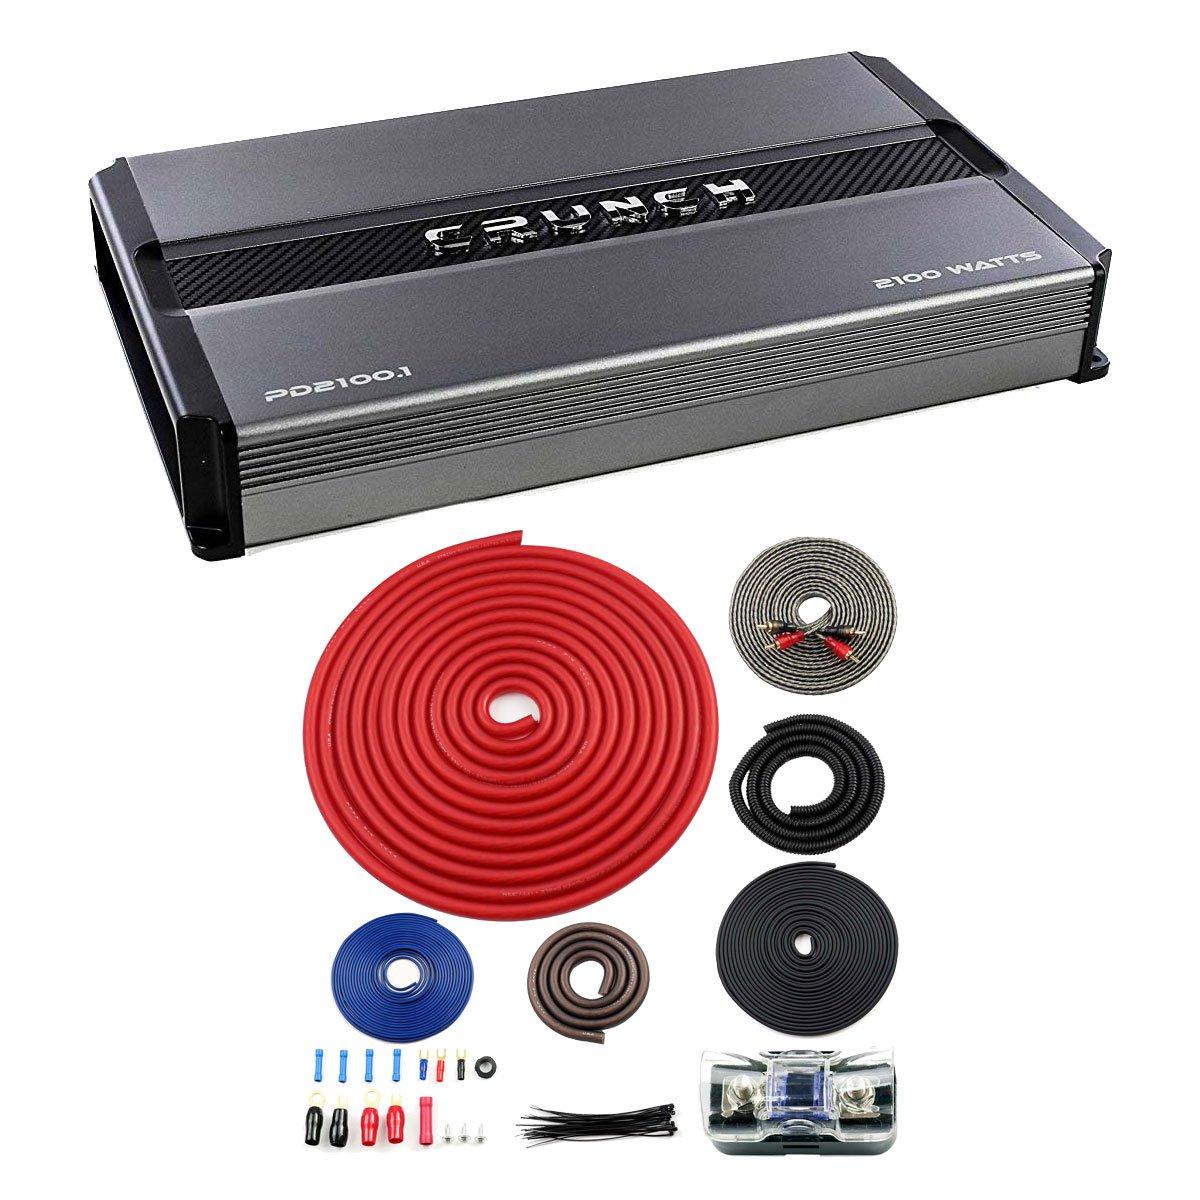 Crunch Power Drive 2100W Mono Class A/B Car Audio Amplifier + 4 Gauge Wiring Kit